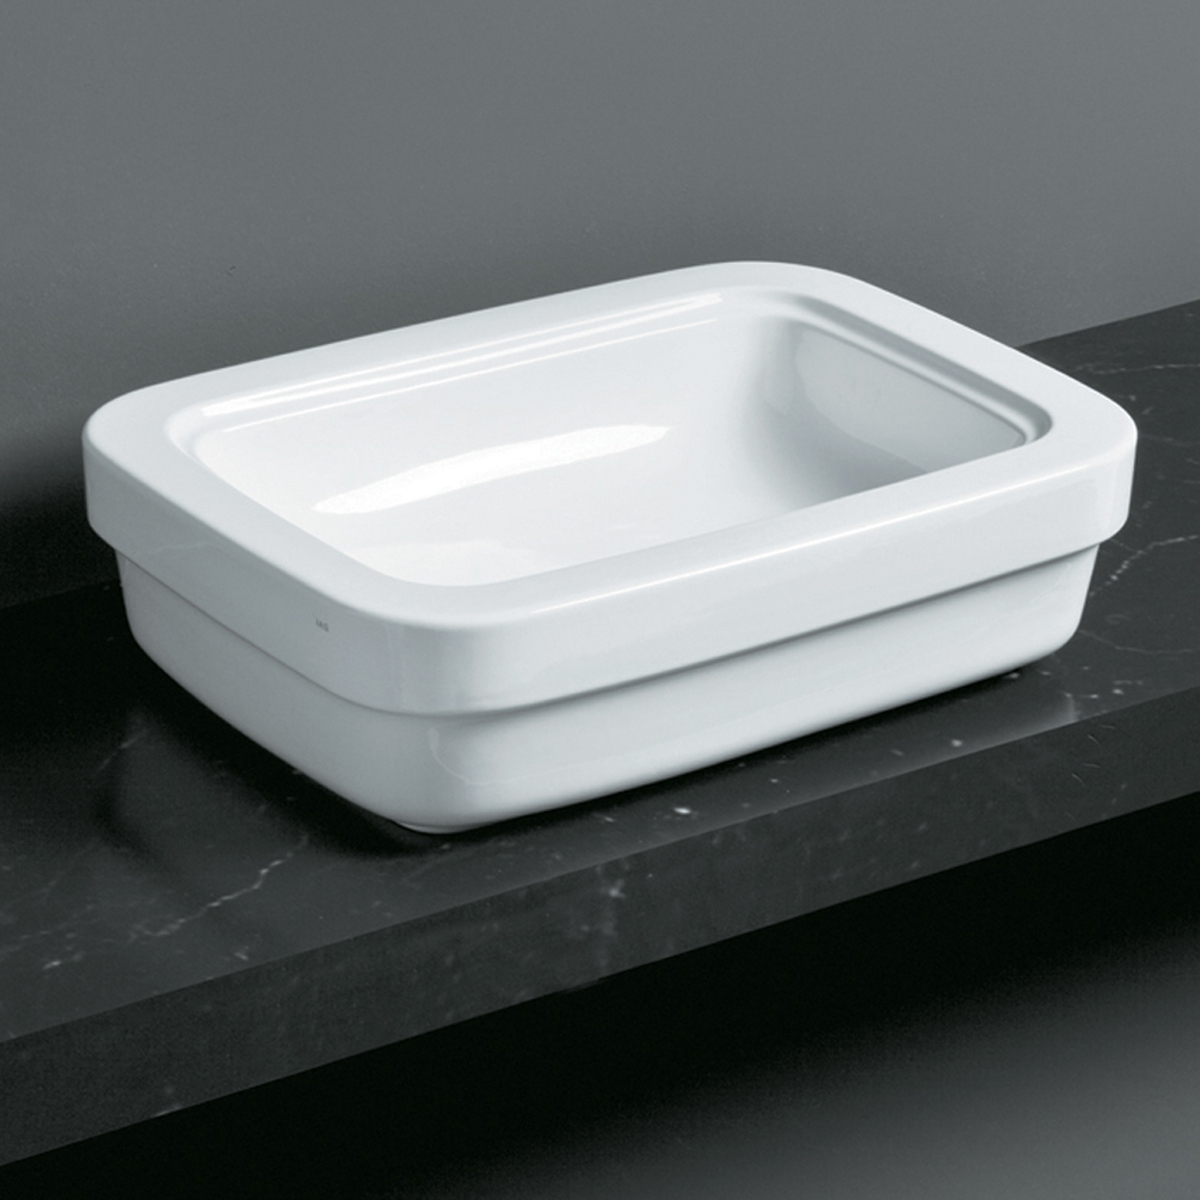 Picture of Bissonnet  Evo 58 Italian Ceramic Sink